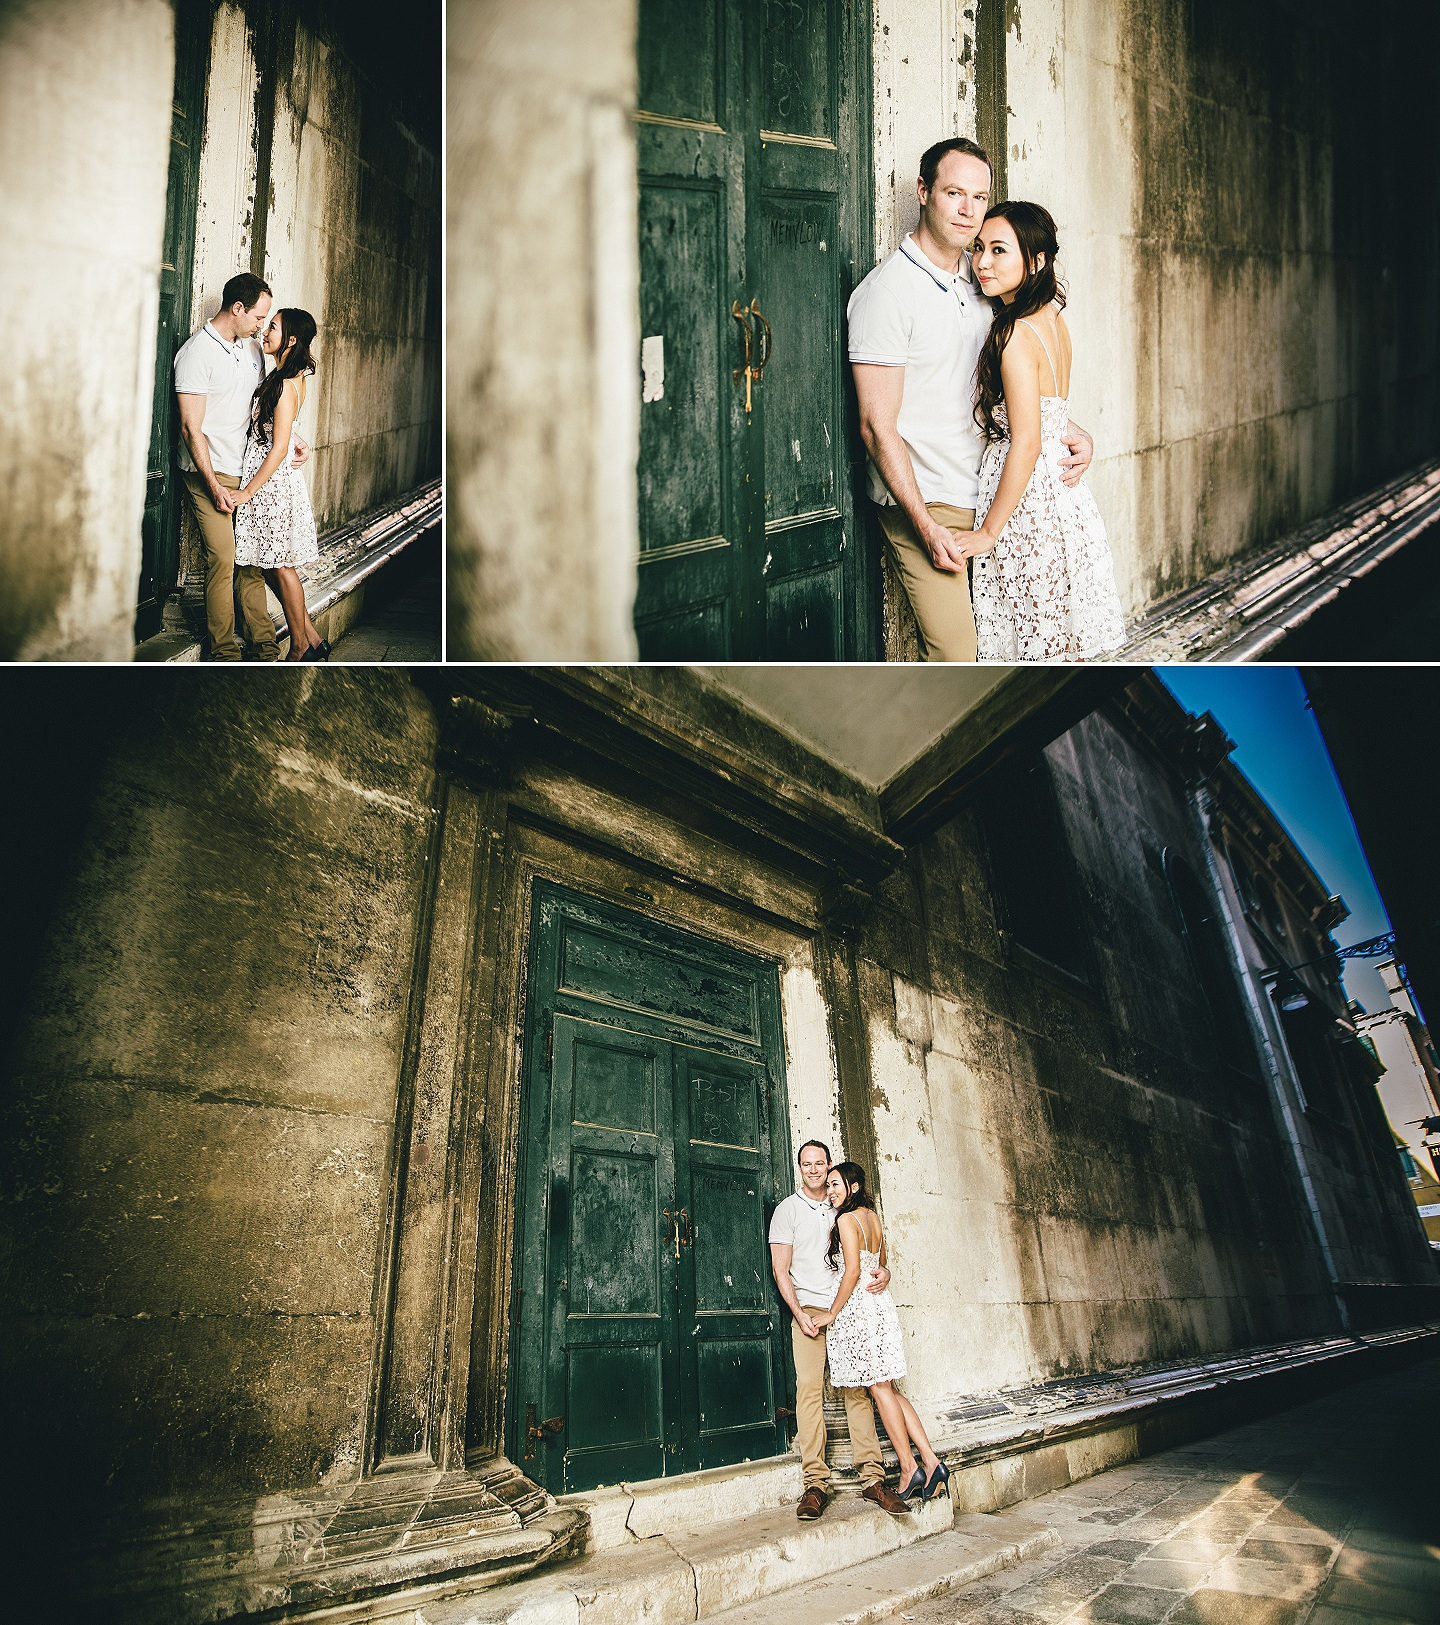 2015-PW-Venice-0011.jpg